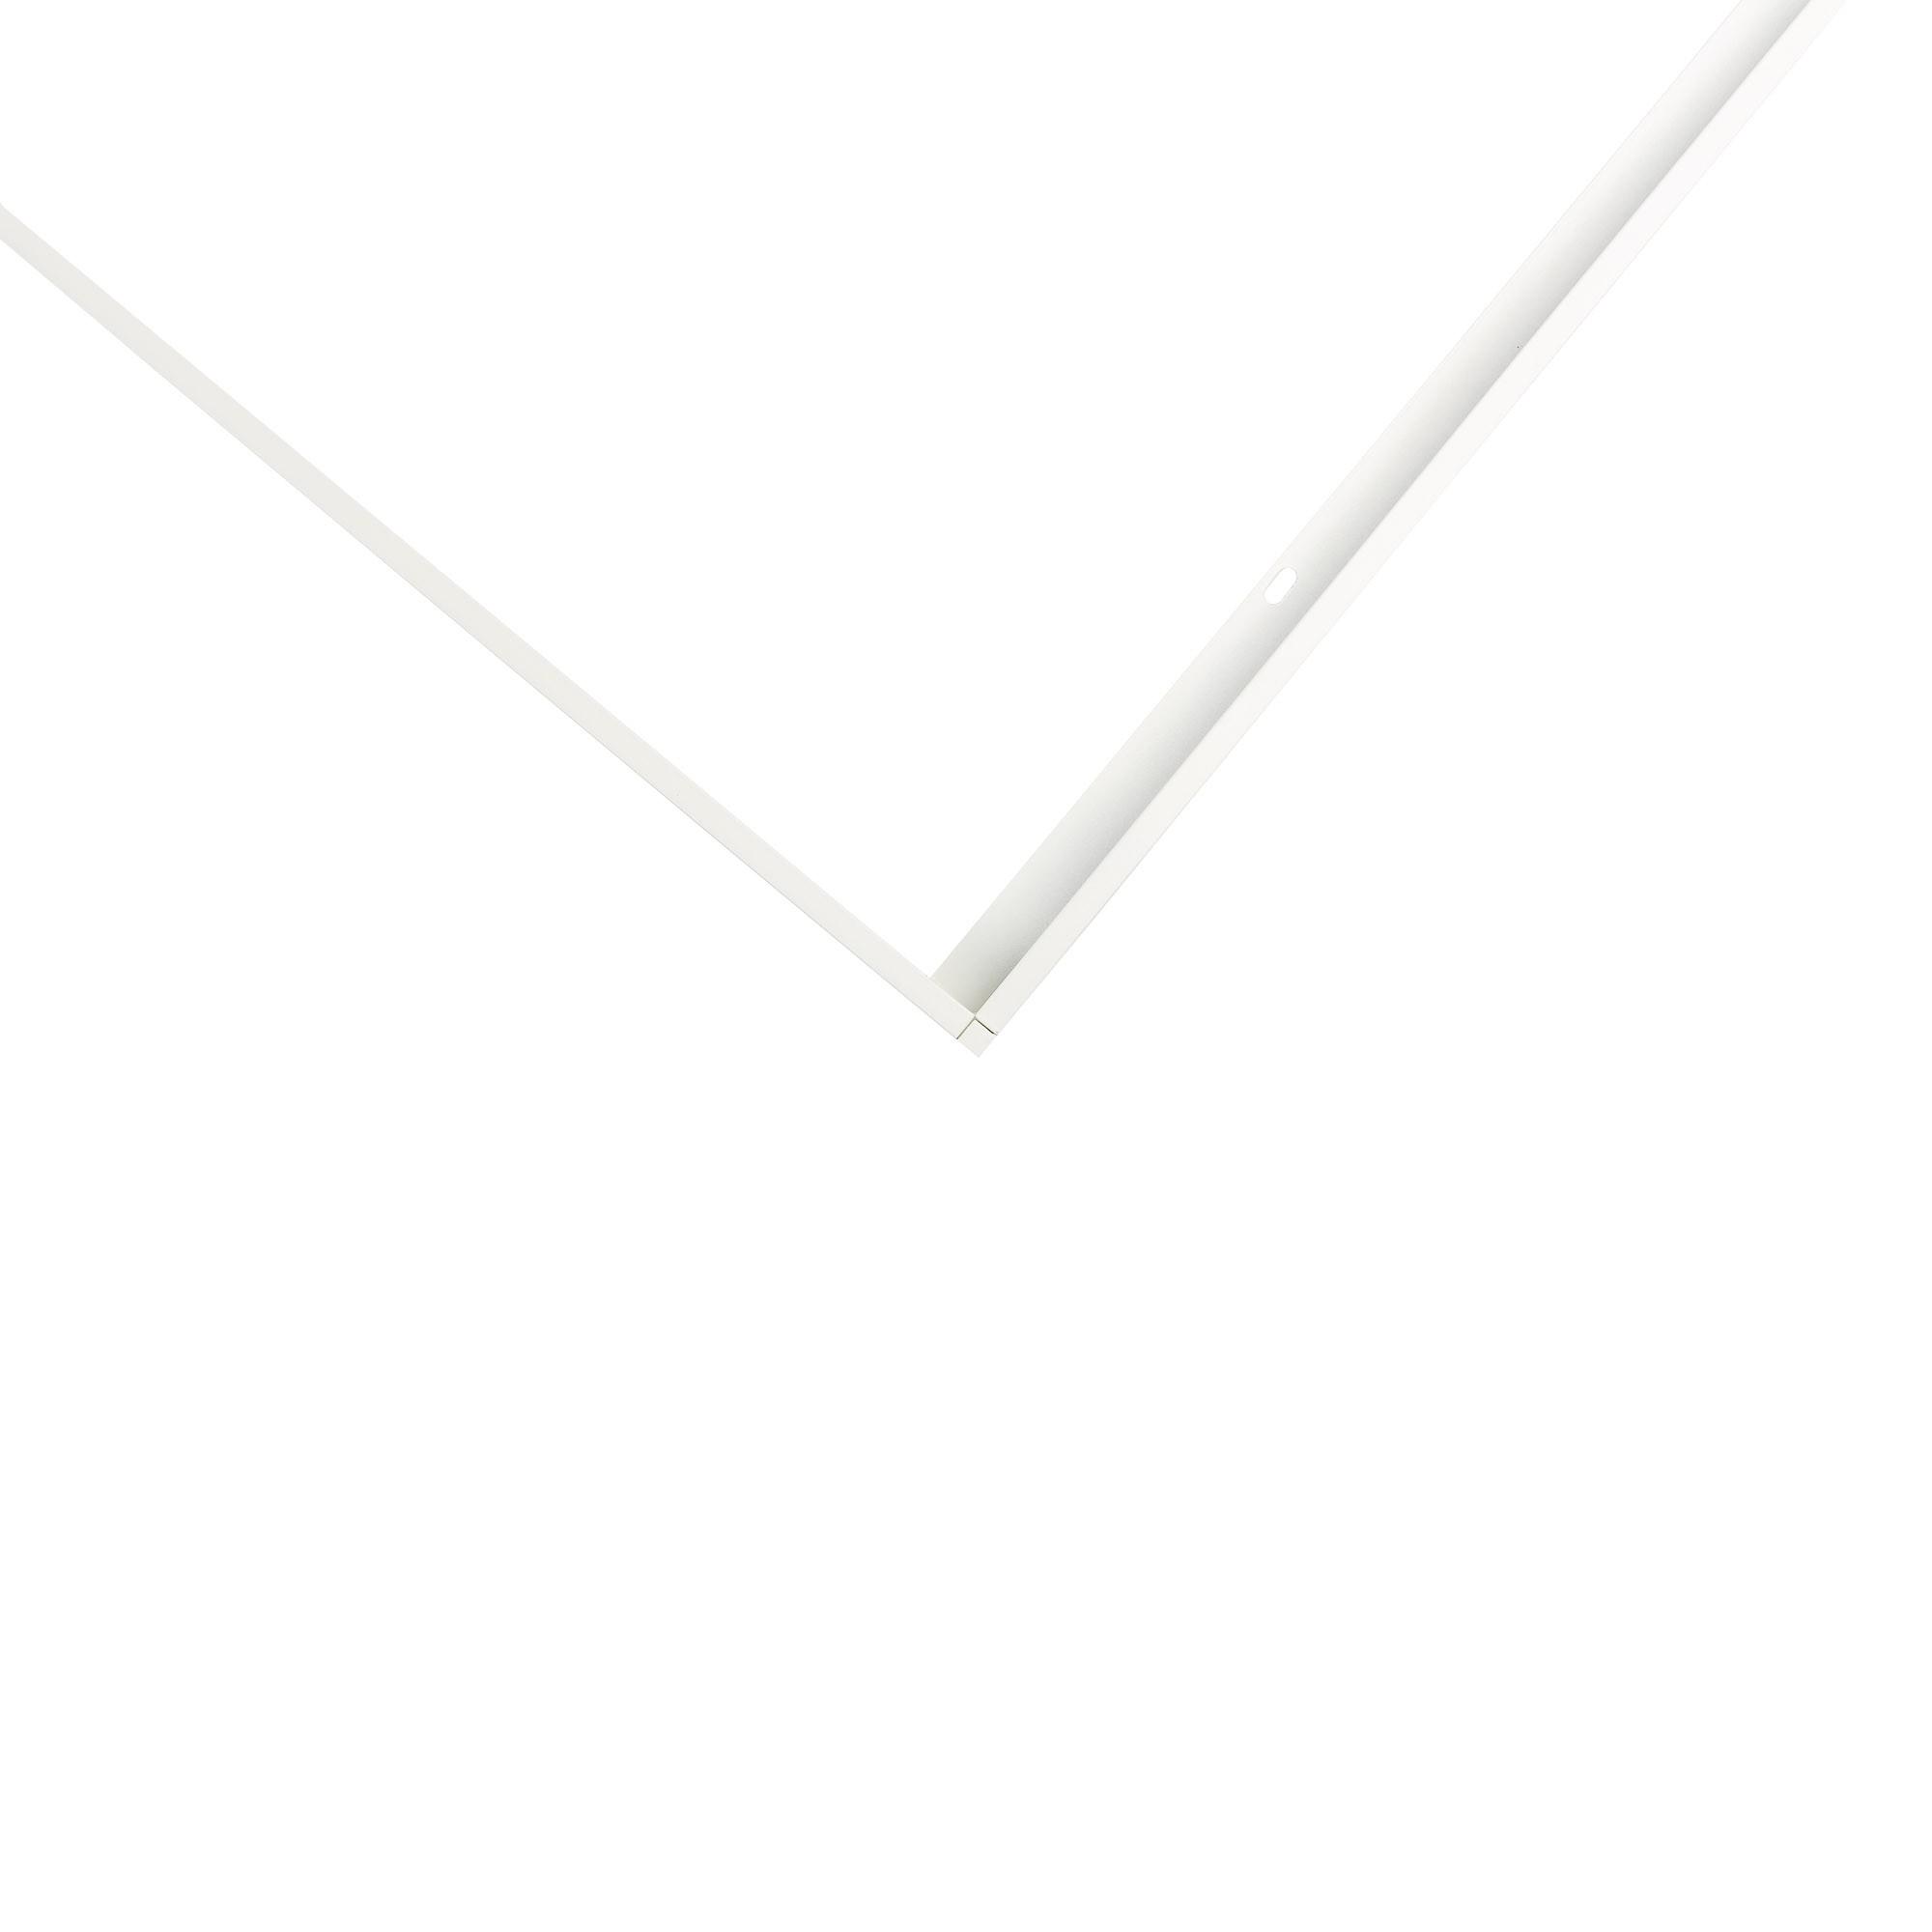 LED SURFACE MOUNT KIT TO SUIT 600 x 600mm LED LIGHT PANEL